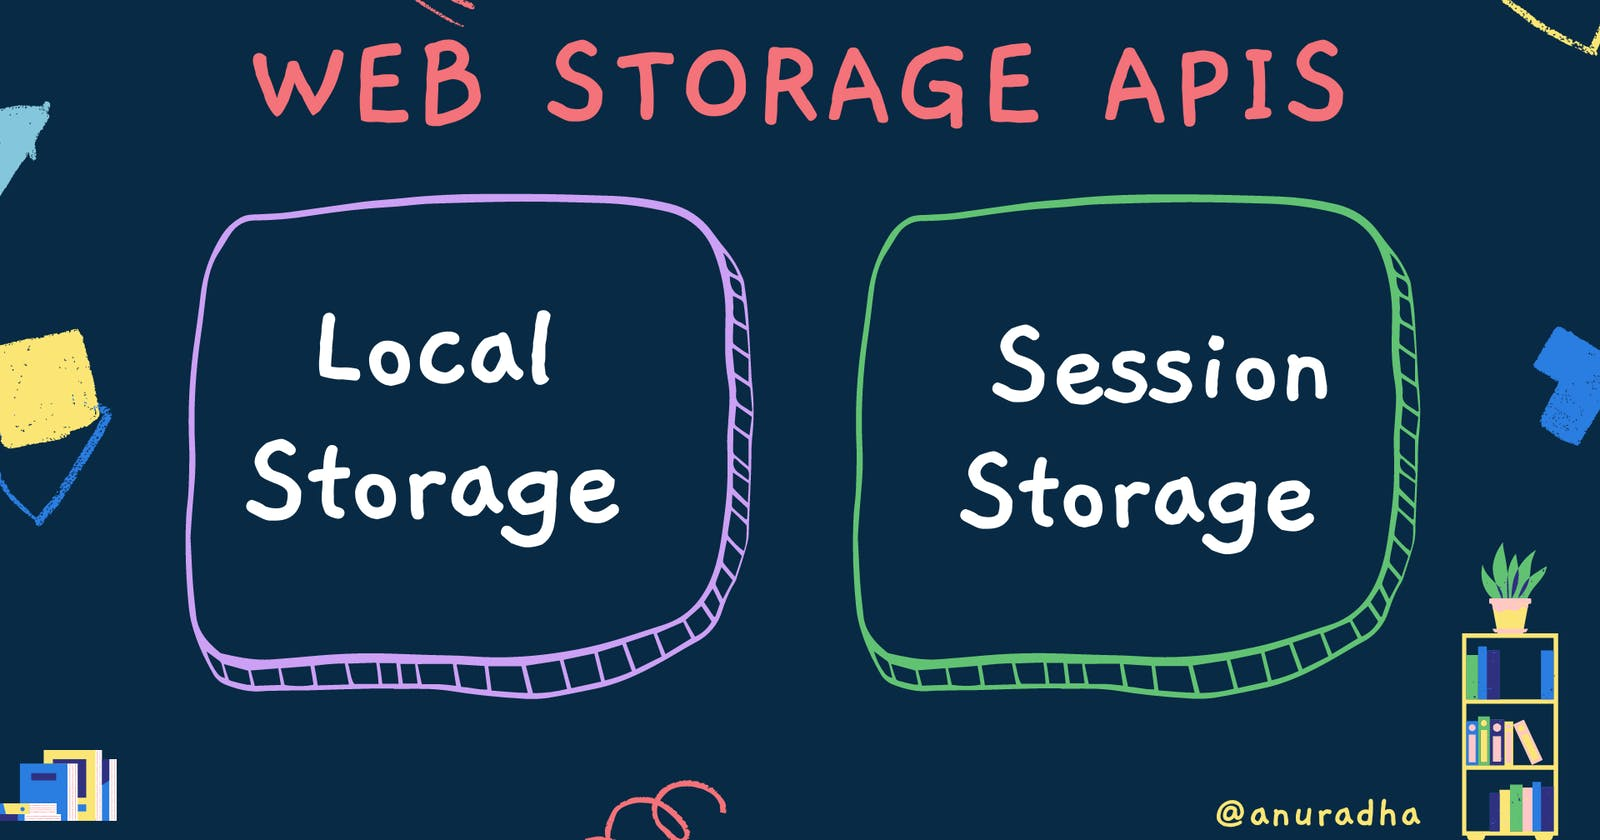 Web Storage APIs